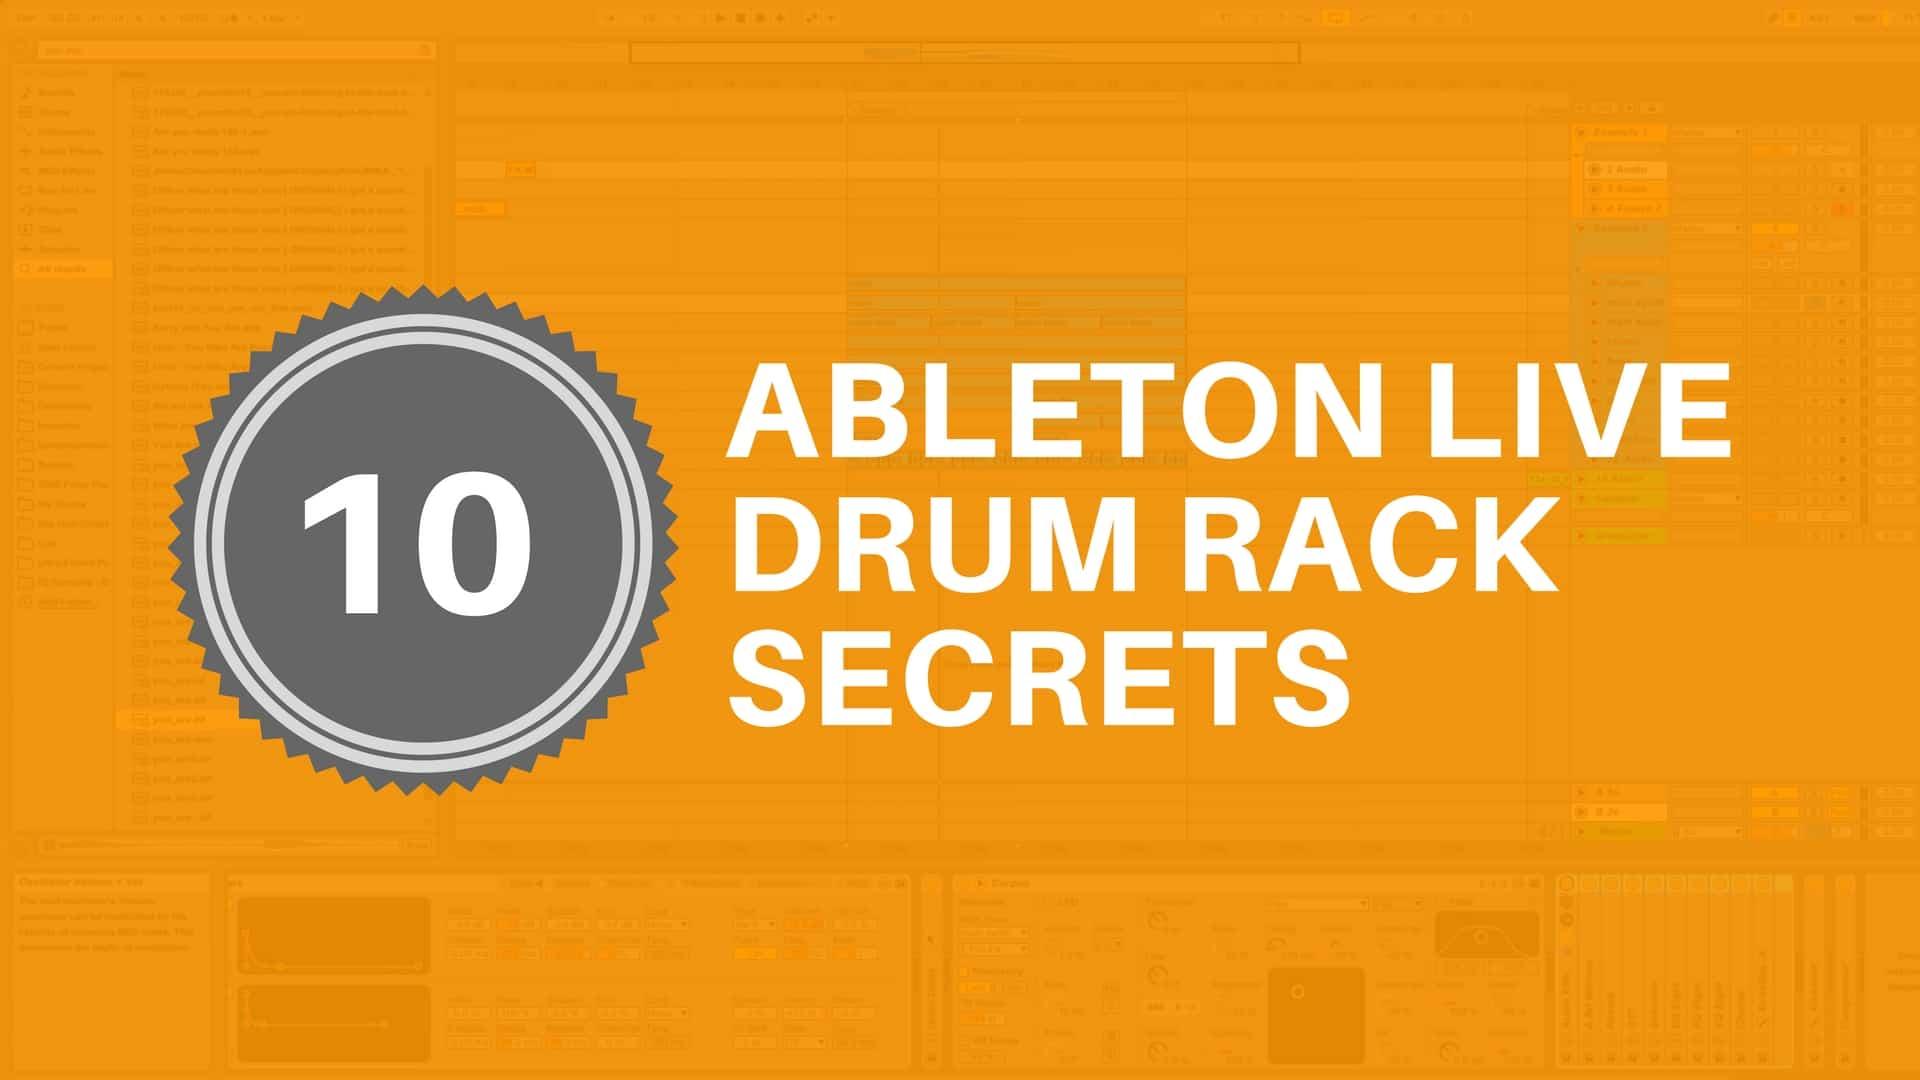 Drum Rack Secrets: 10 Tips to Help You Master Live's Drum Racks